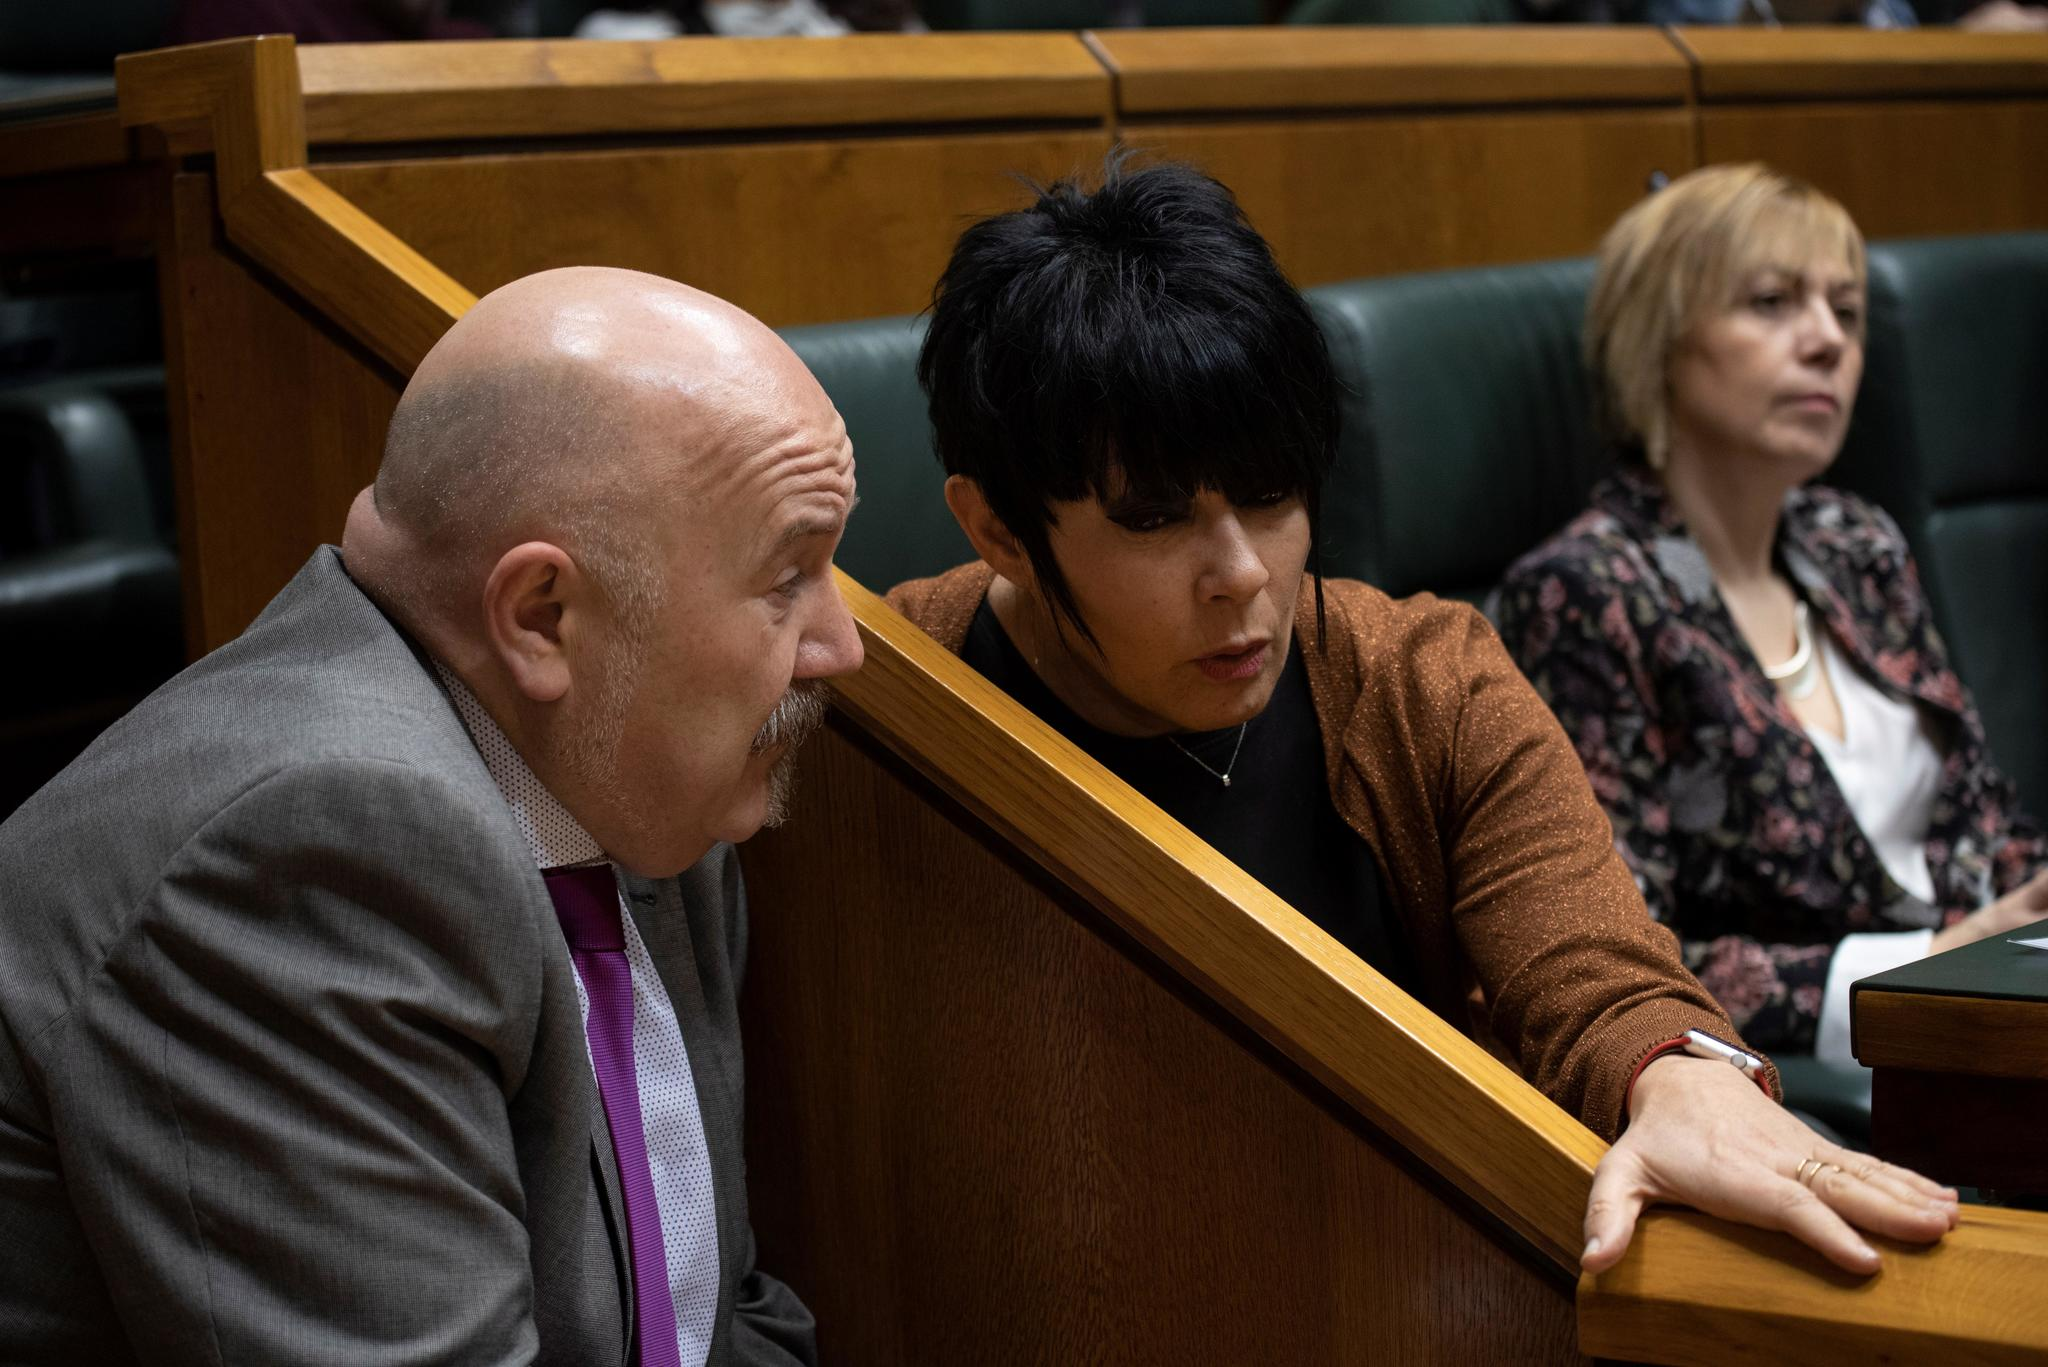 Iturrate conversa con Iriarte, hoy en el Parlamento Vasco.